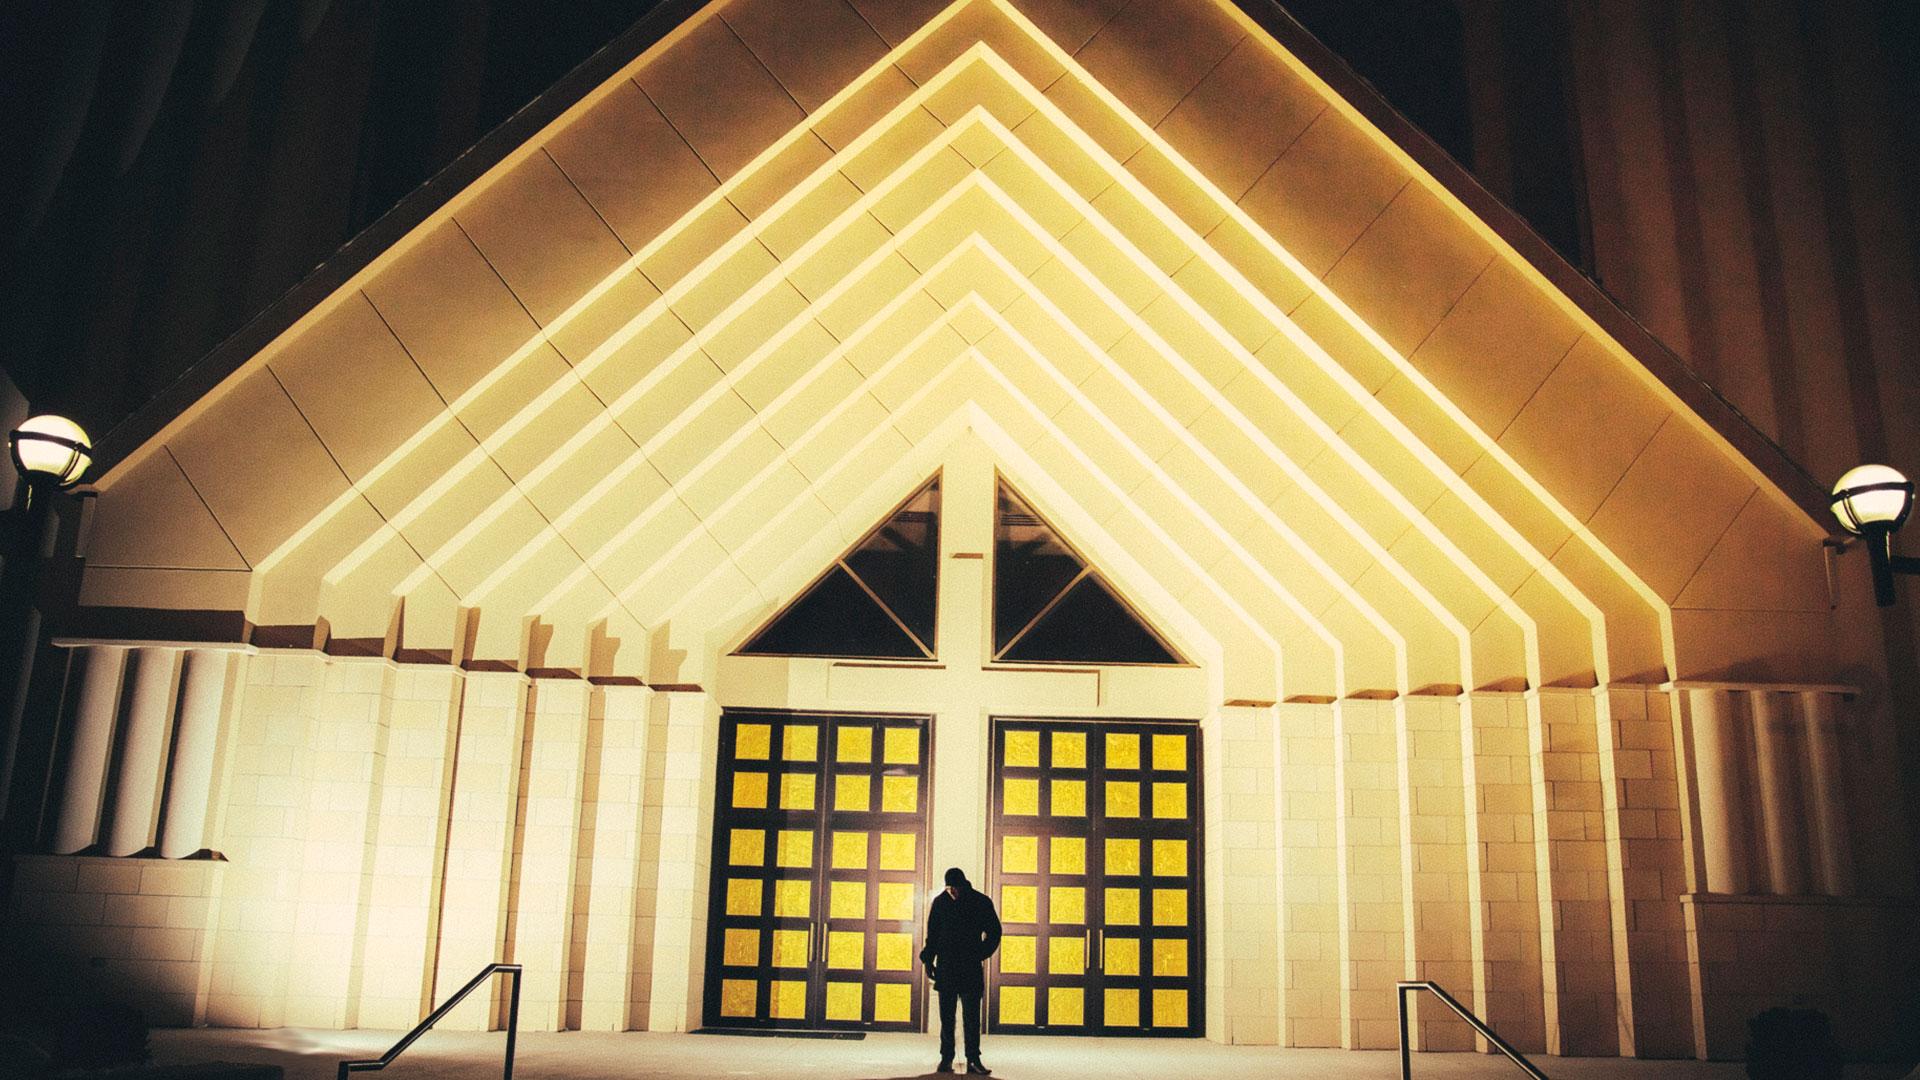 epic_sky_pictures_eshoot_church_artistic_toronto_canada_groom_ceremony_night_photography_brampton_ontario_epicskypictures_site